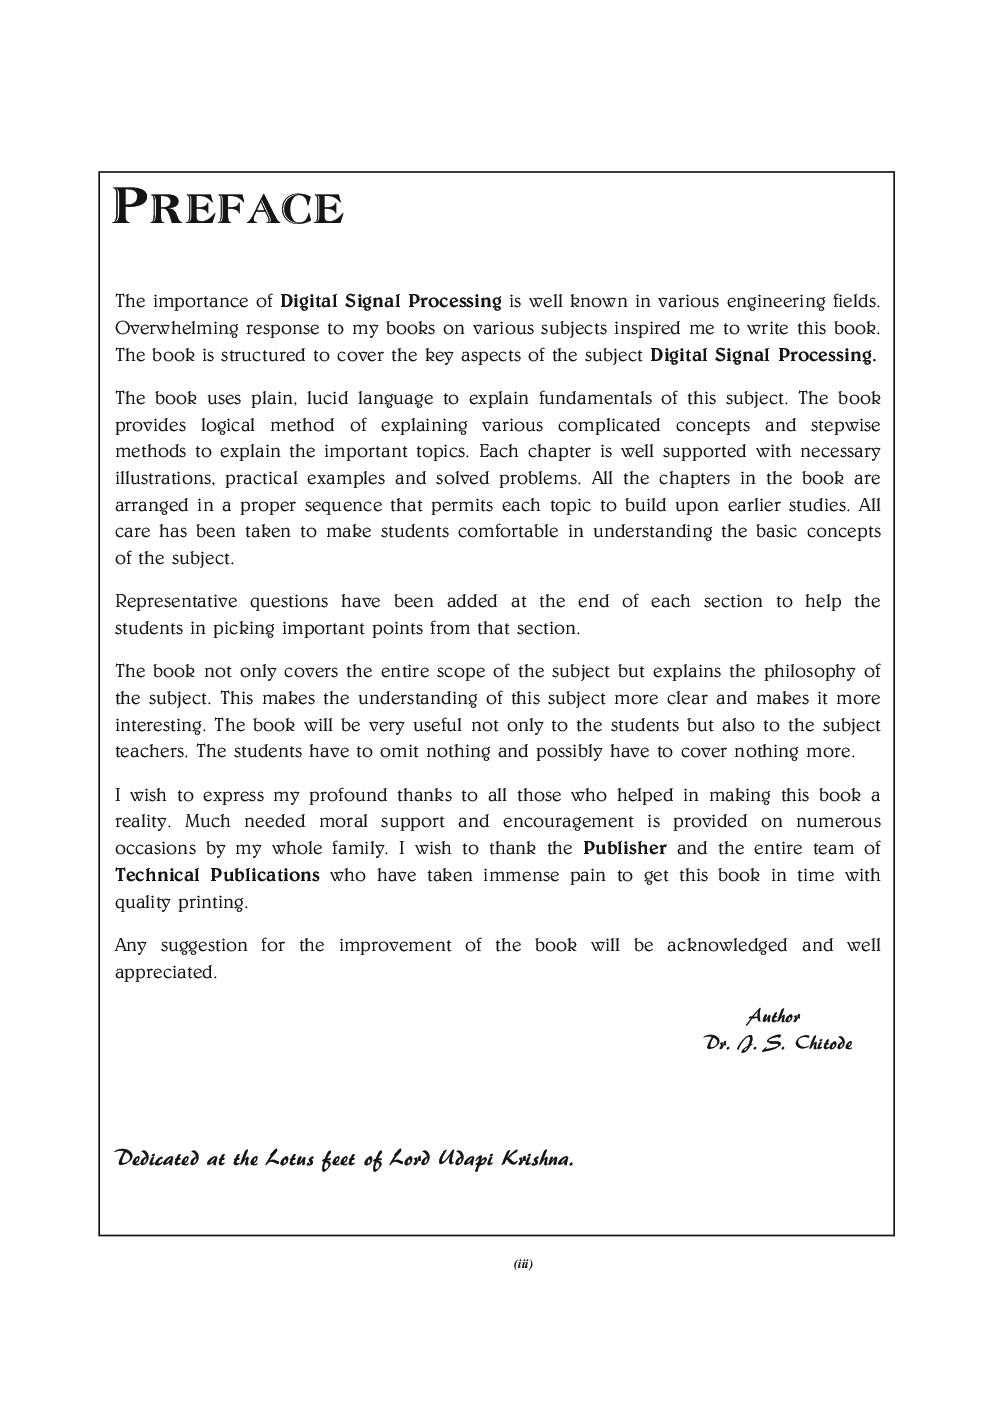 Digital Signal Processing For VTU - Page 4